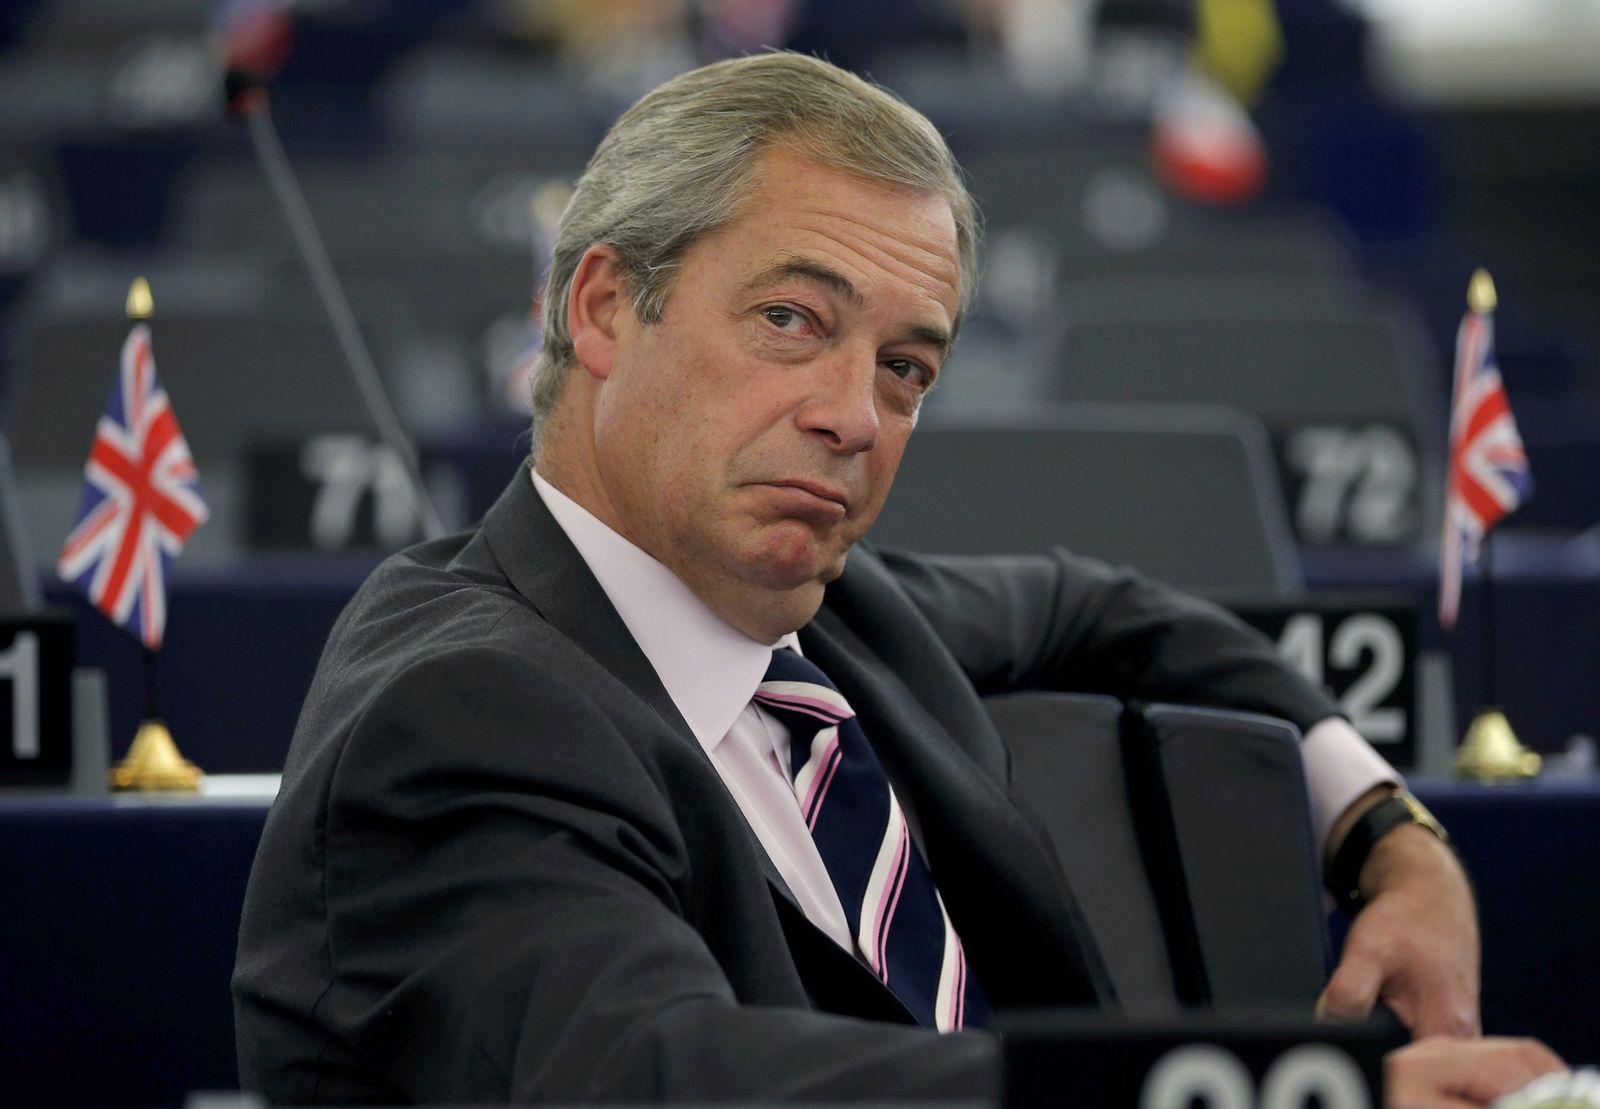 BRITAIN-EU/MOVIE